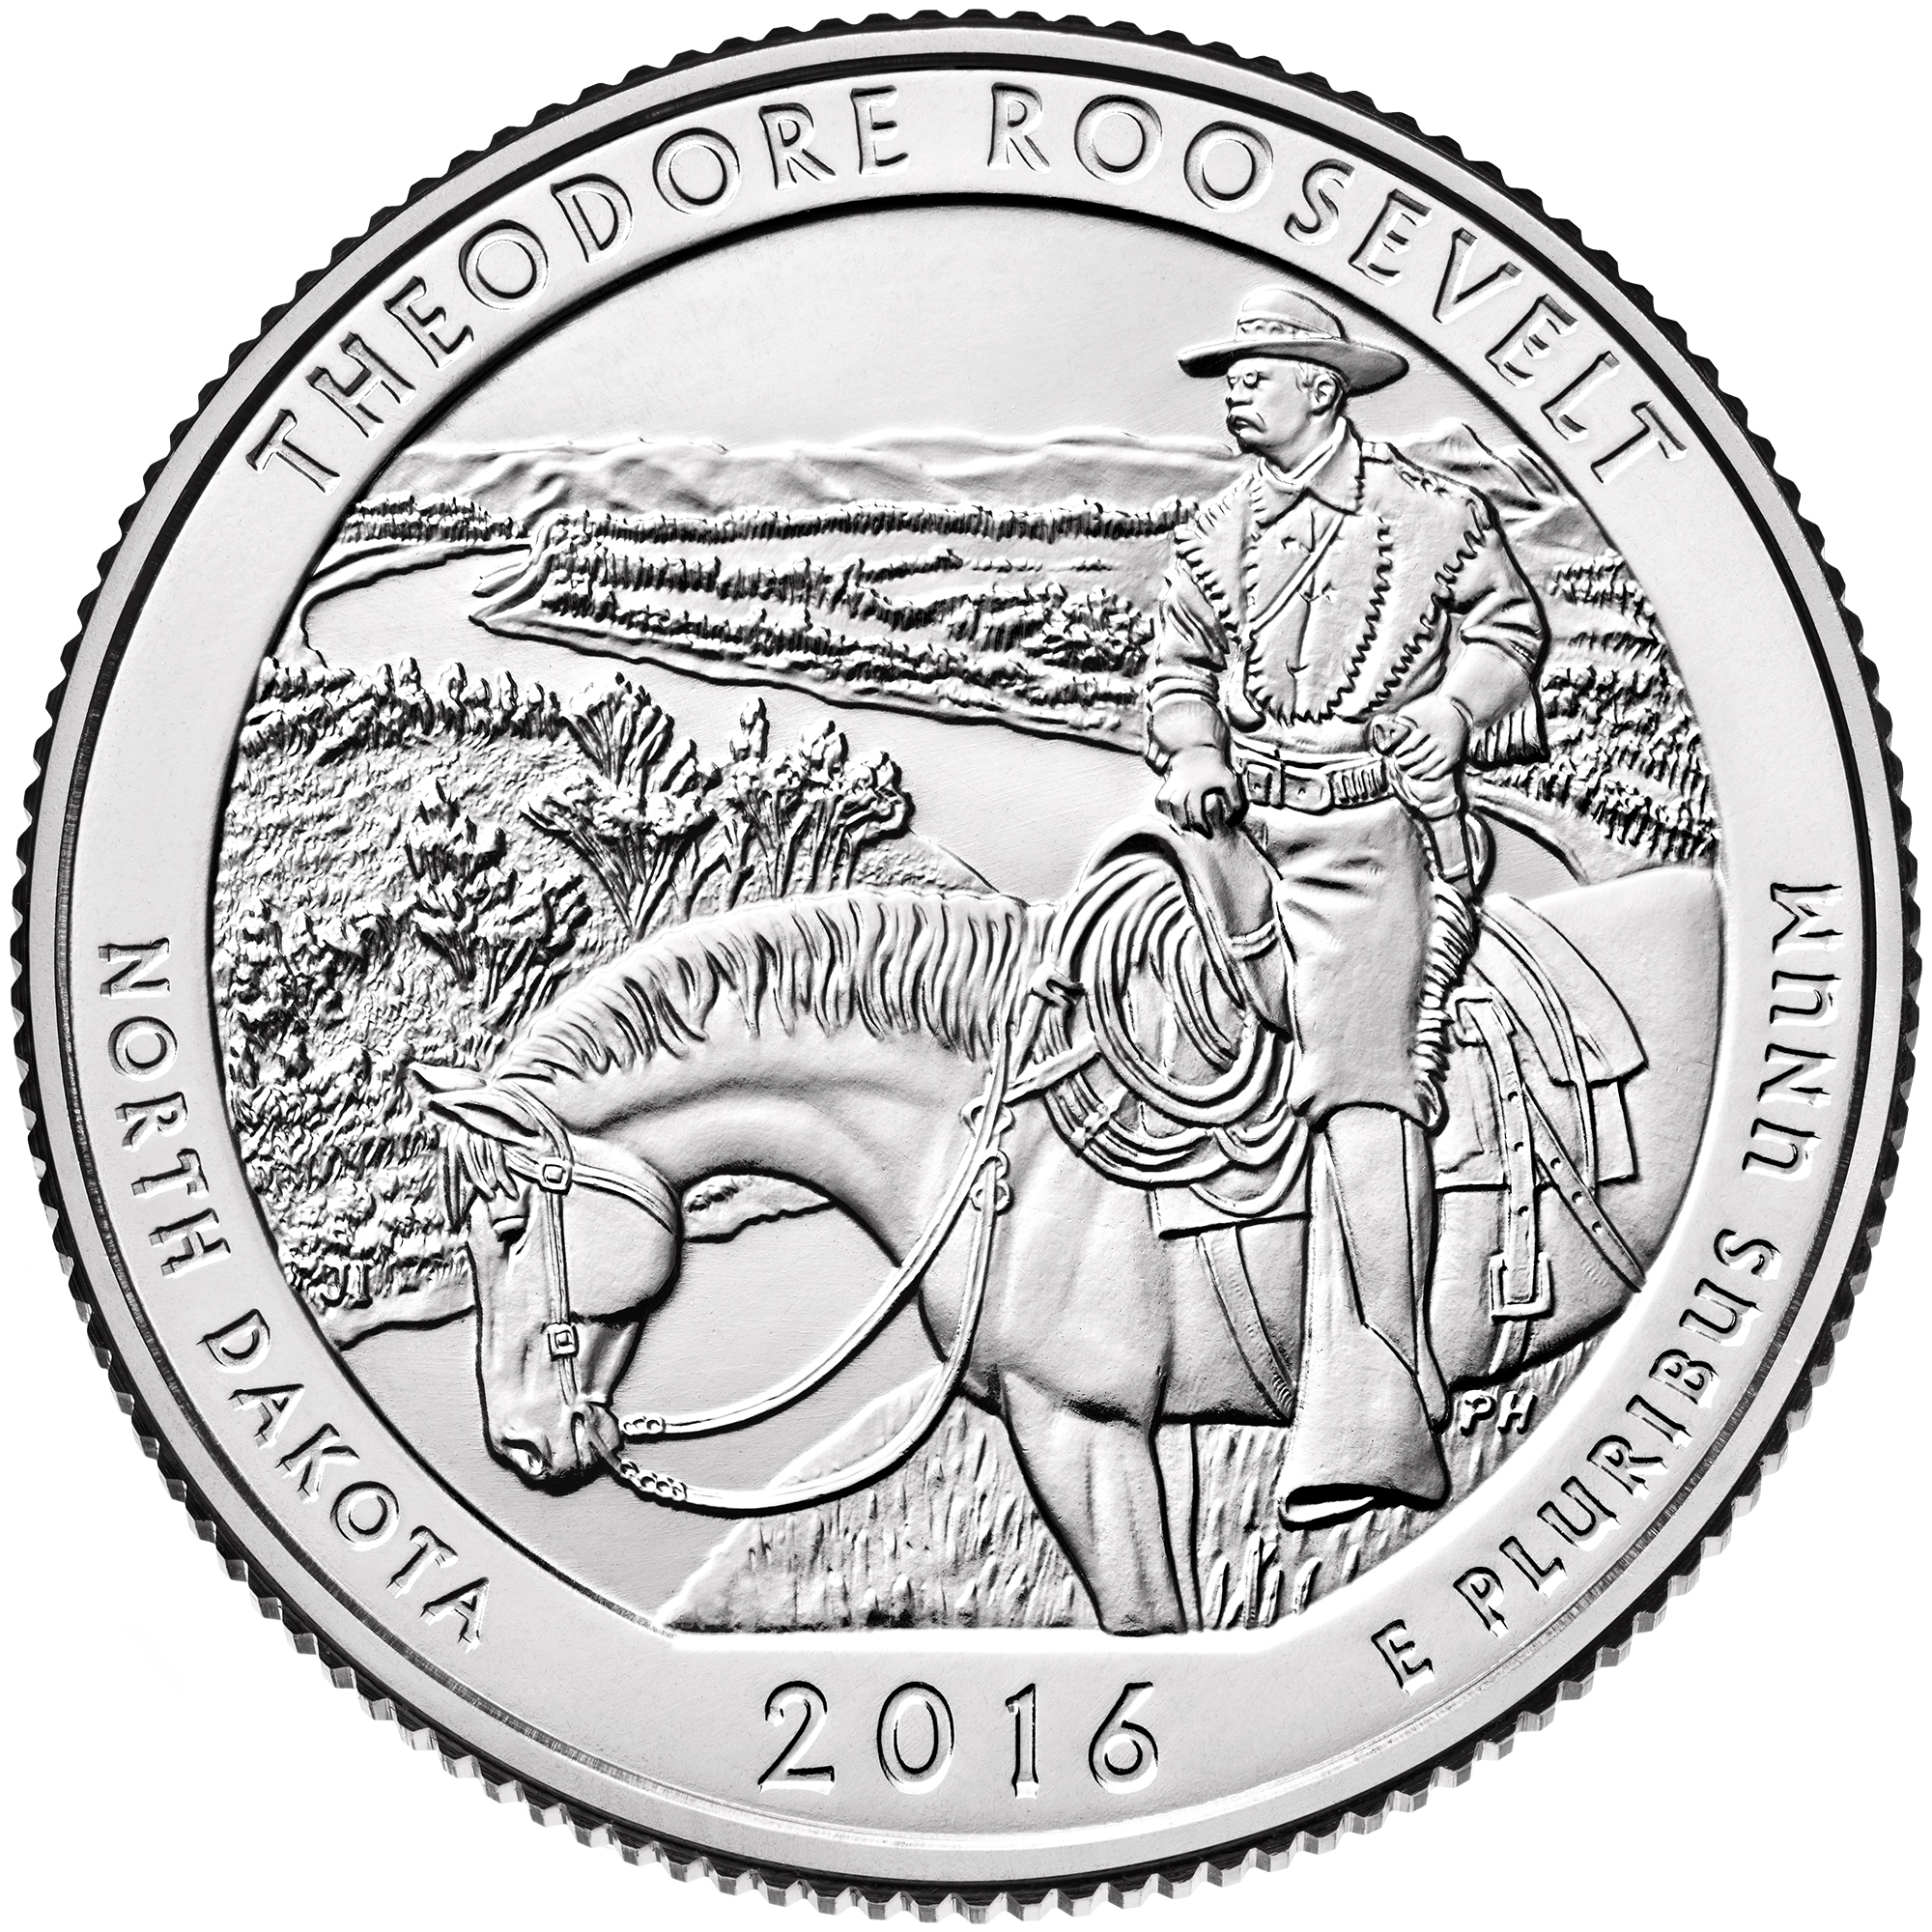 2000x2000 Fileus Coin 25c 2016 Atb Theodore Roosevelt.jpg